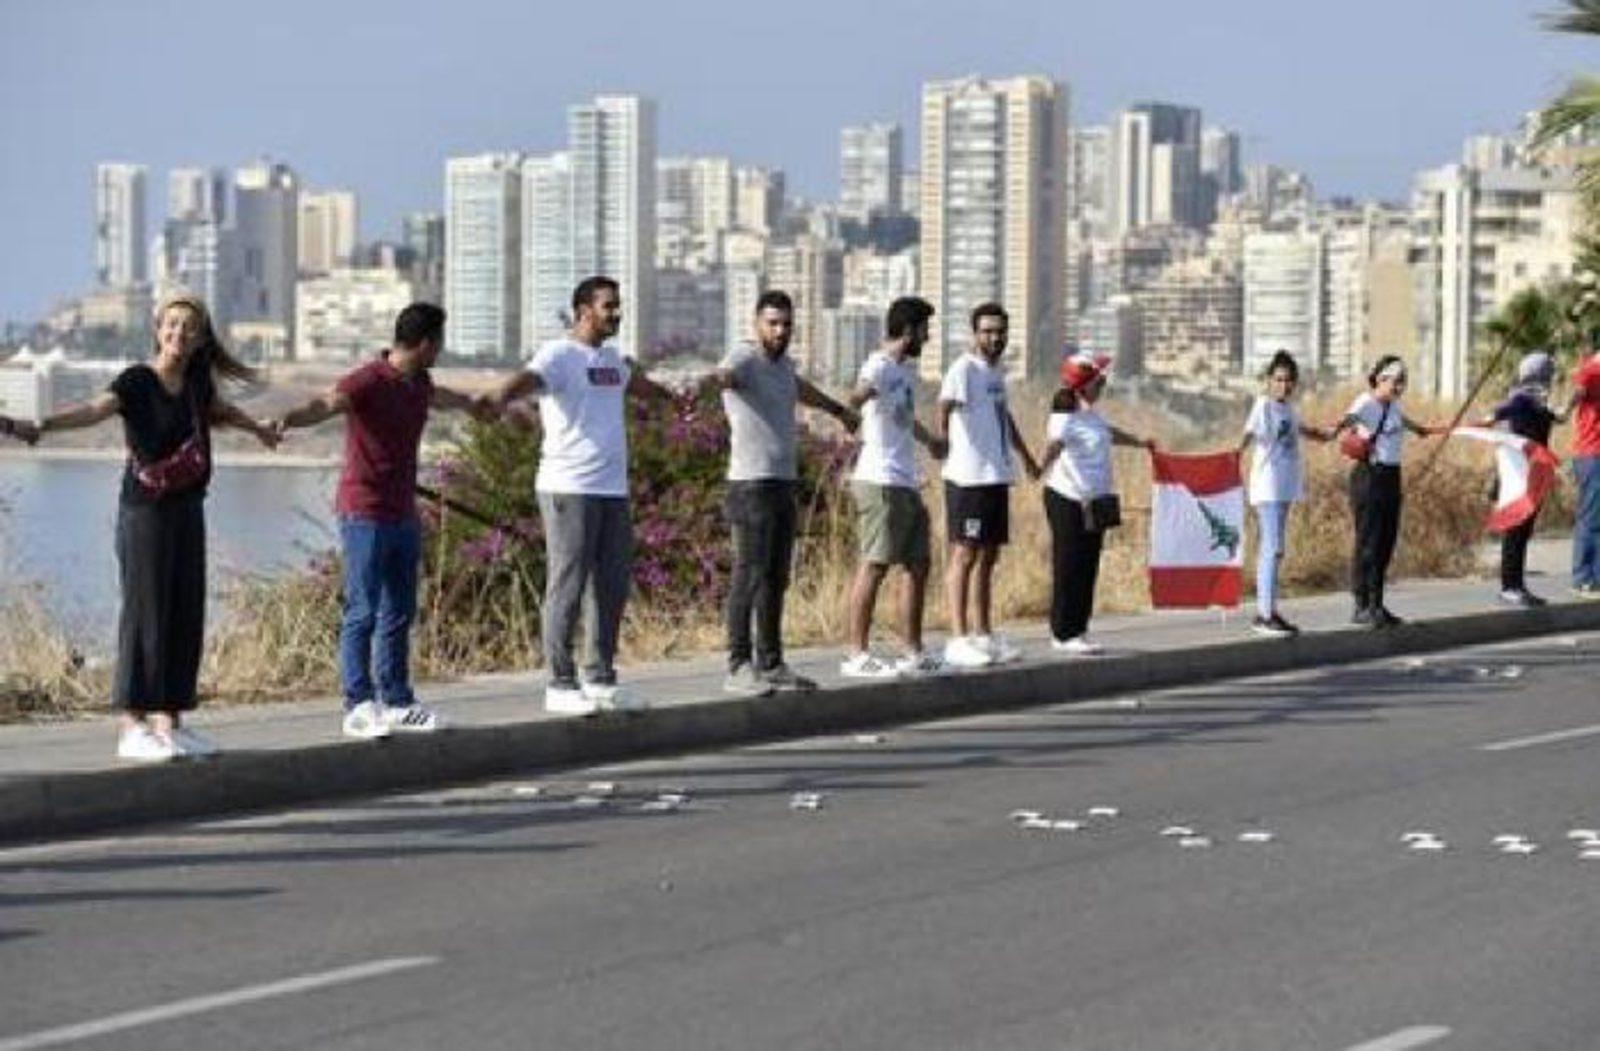 20191030-Libanon-protesten